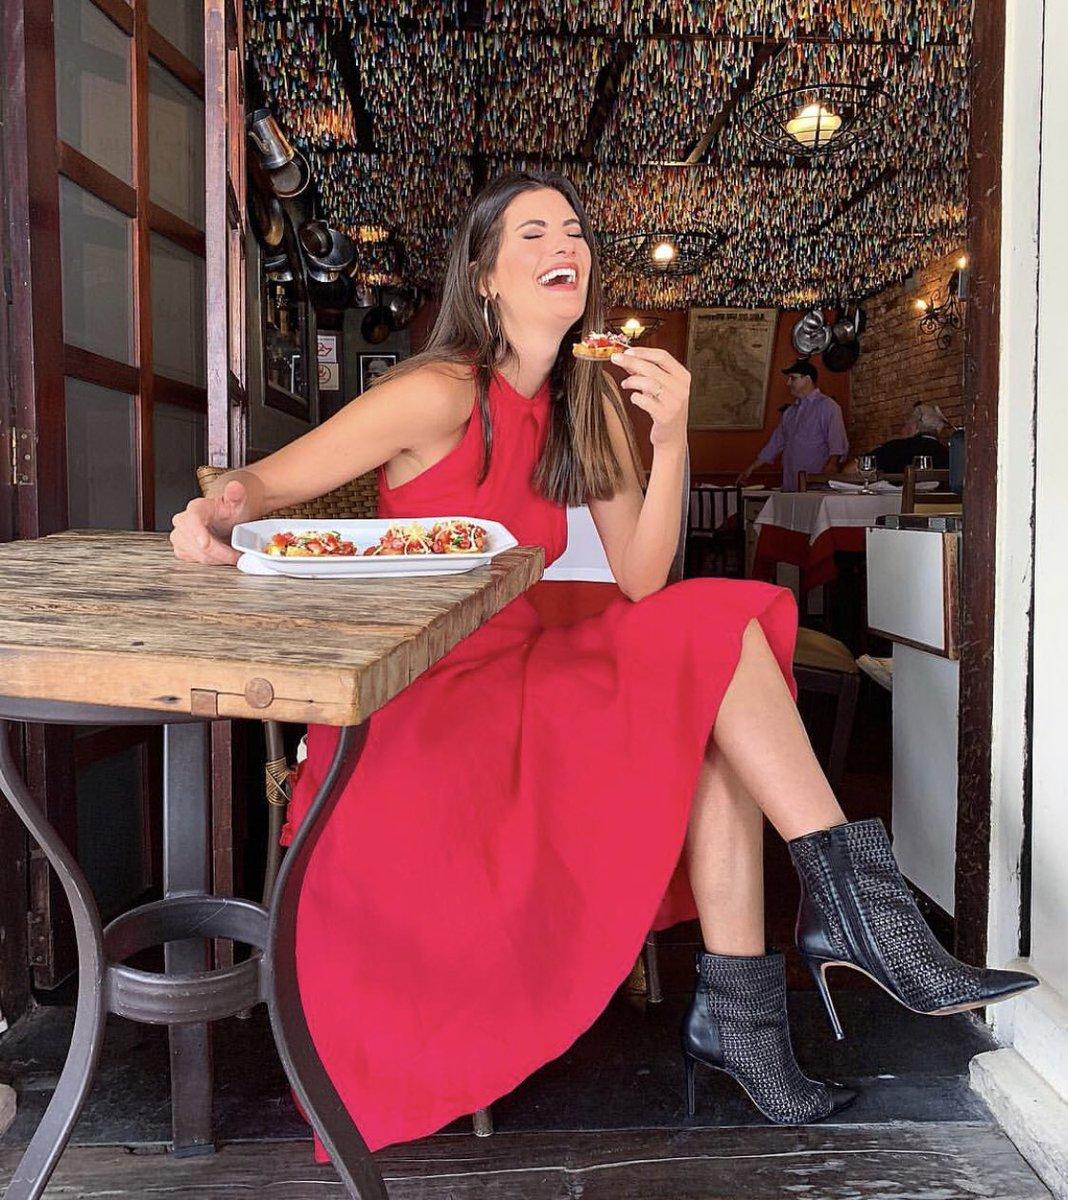 Gravando #esquadraodamoda e me jogando com tudo na bruschetta de tomate !!! Styling @GuzmanTamara https://t.co/mstIWFO8am